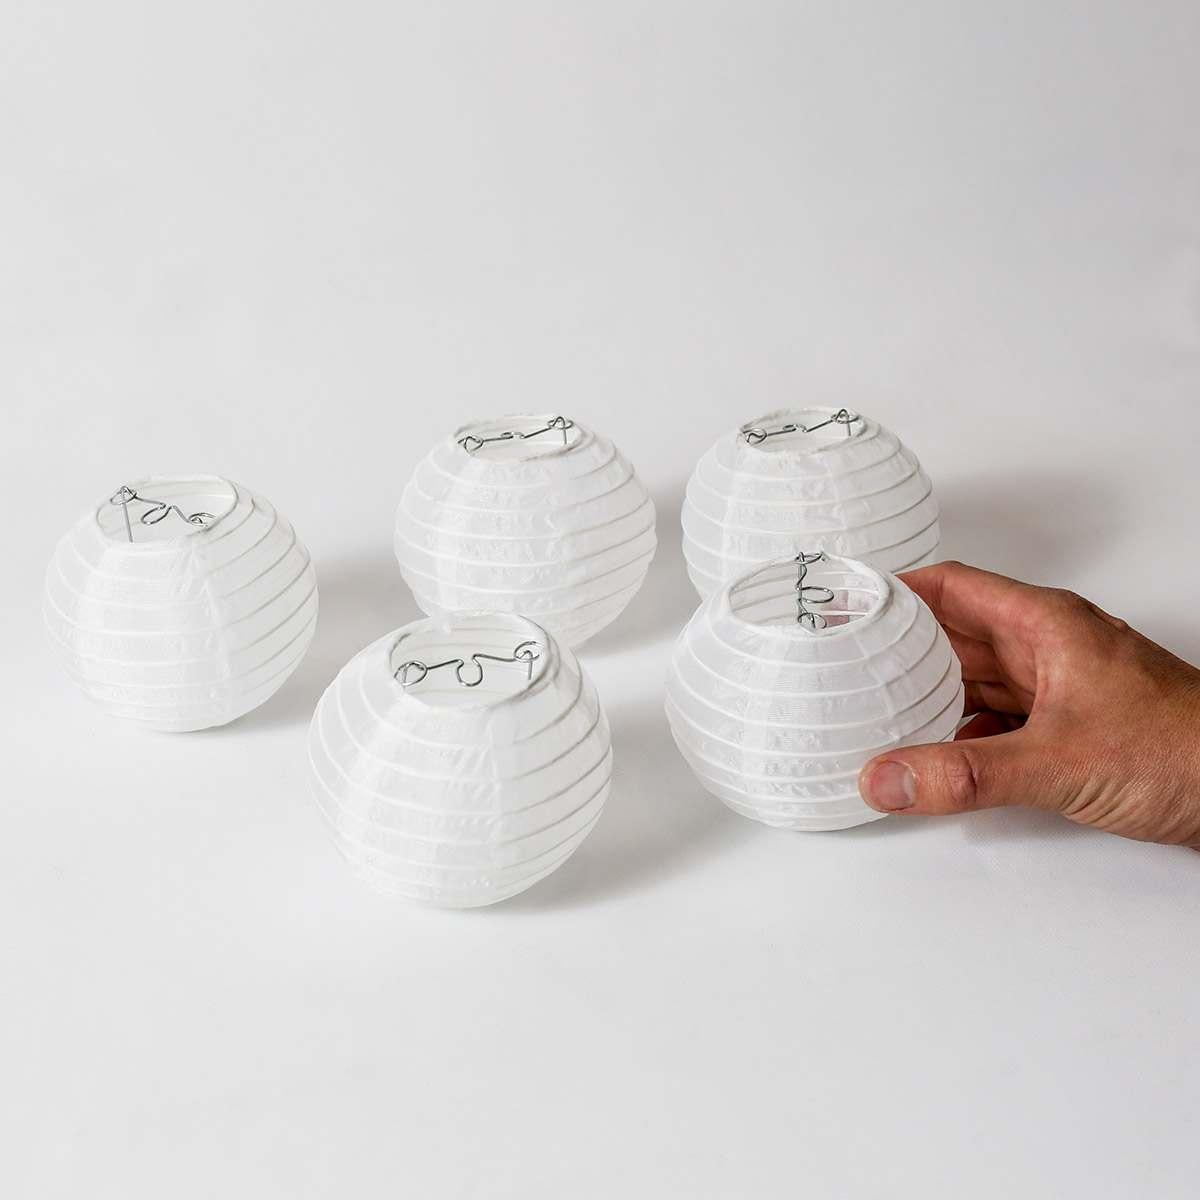 10cm White Chinese Lanterns Pack Of 5